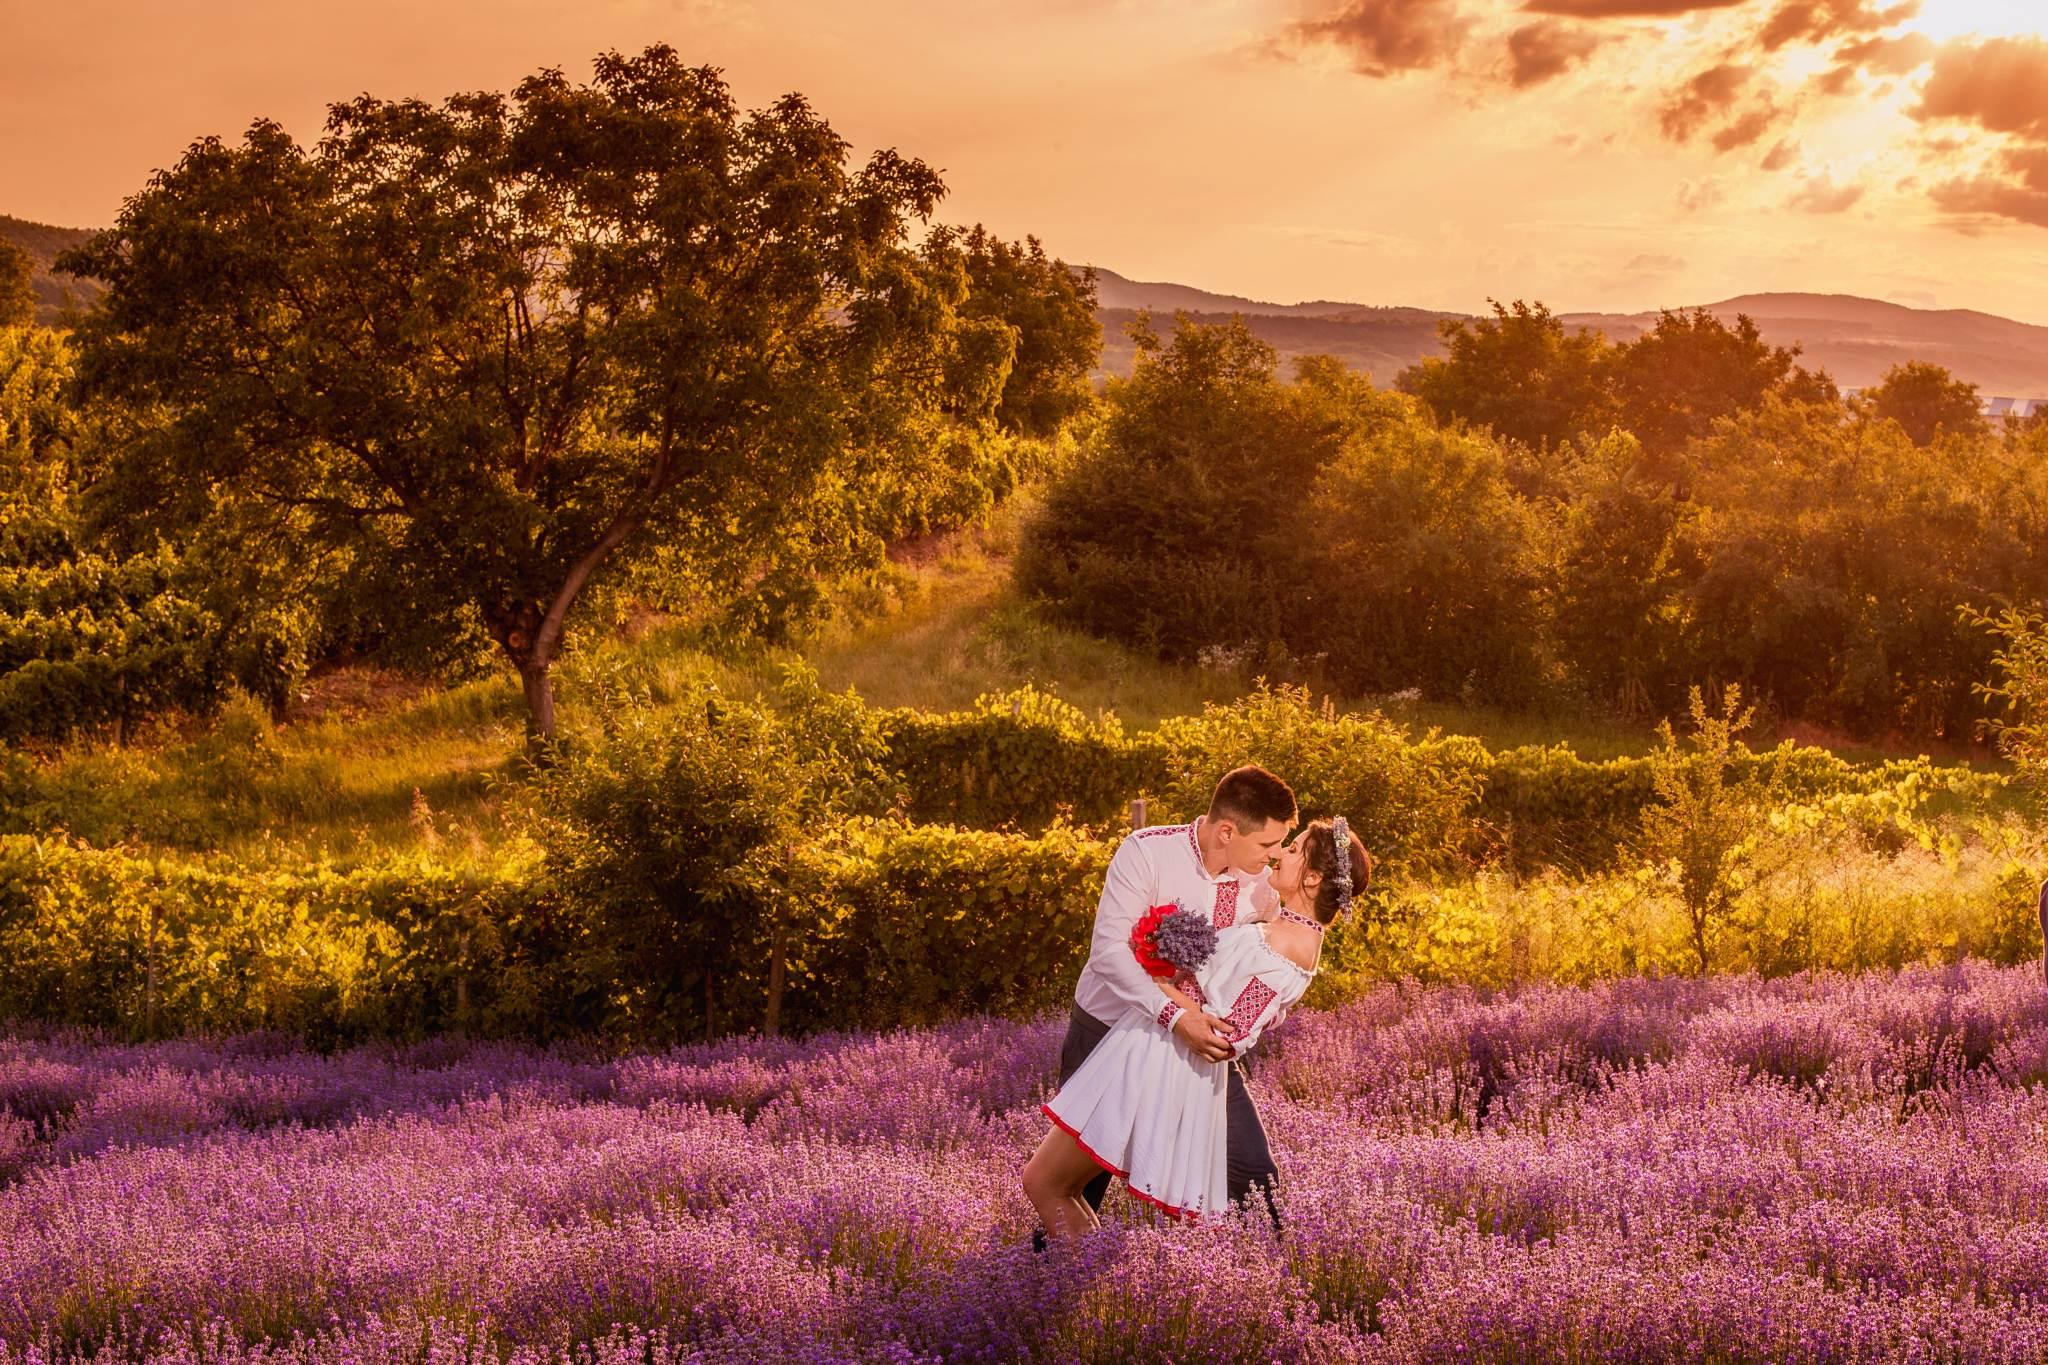 fotografii-nunta-cristina-si-sorin13.jpg